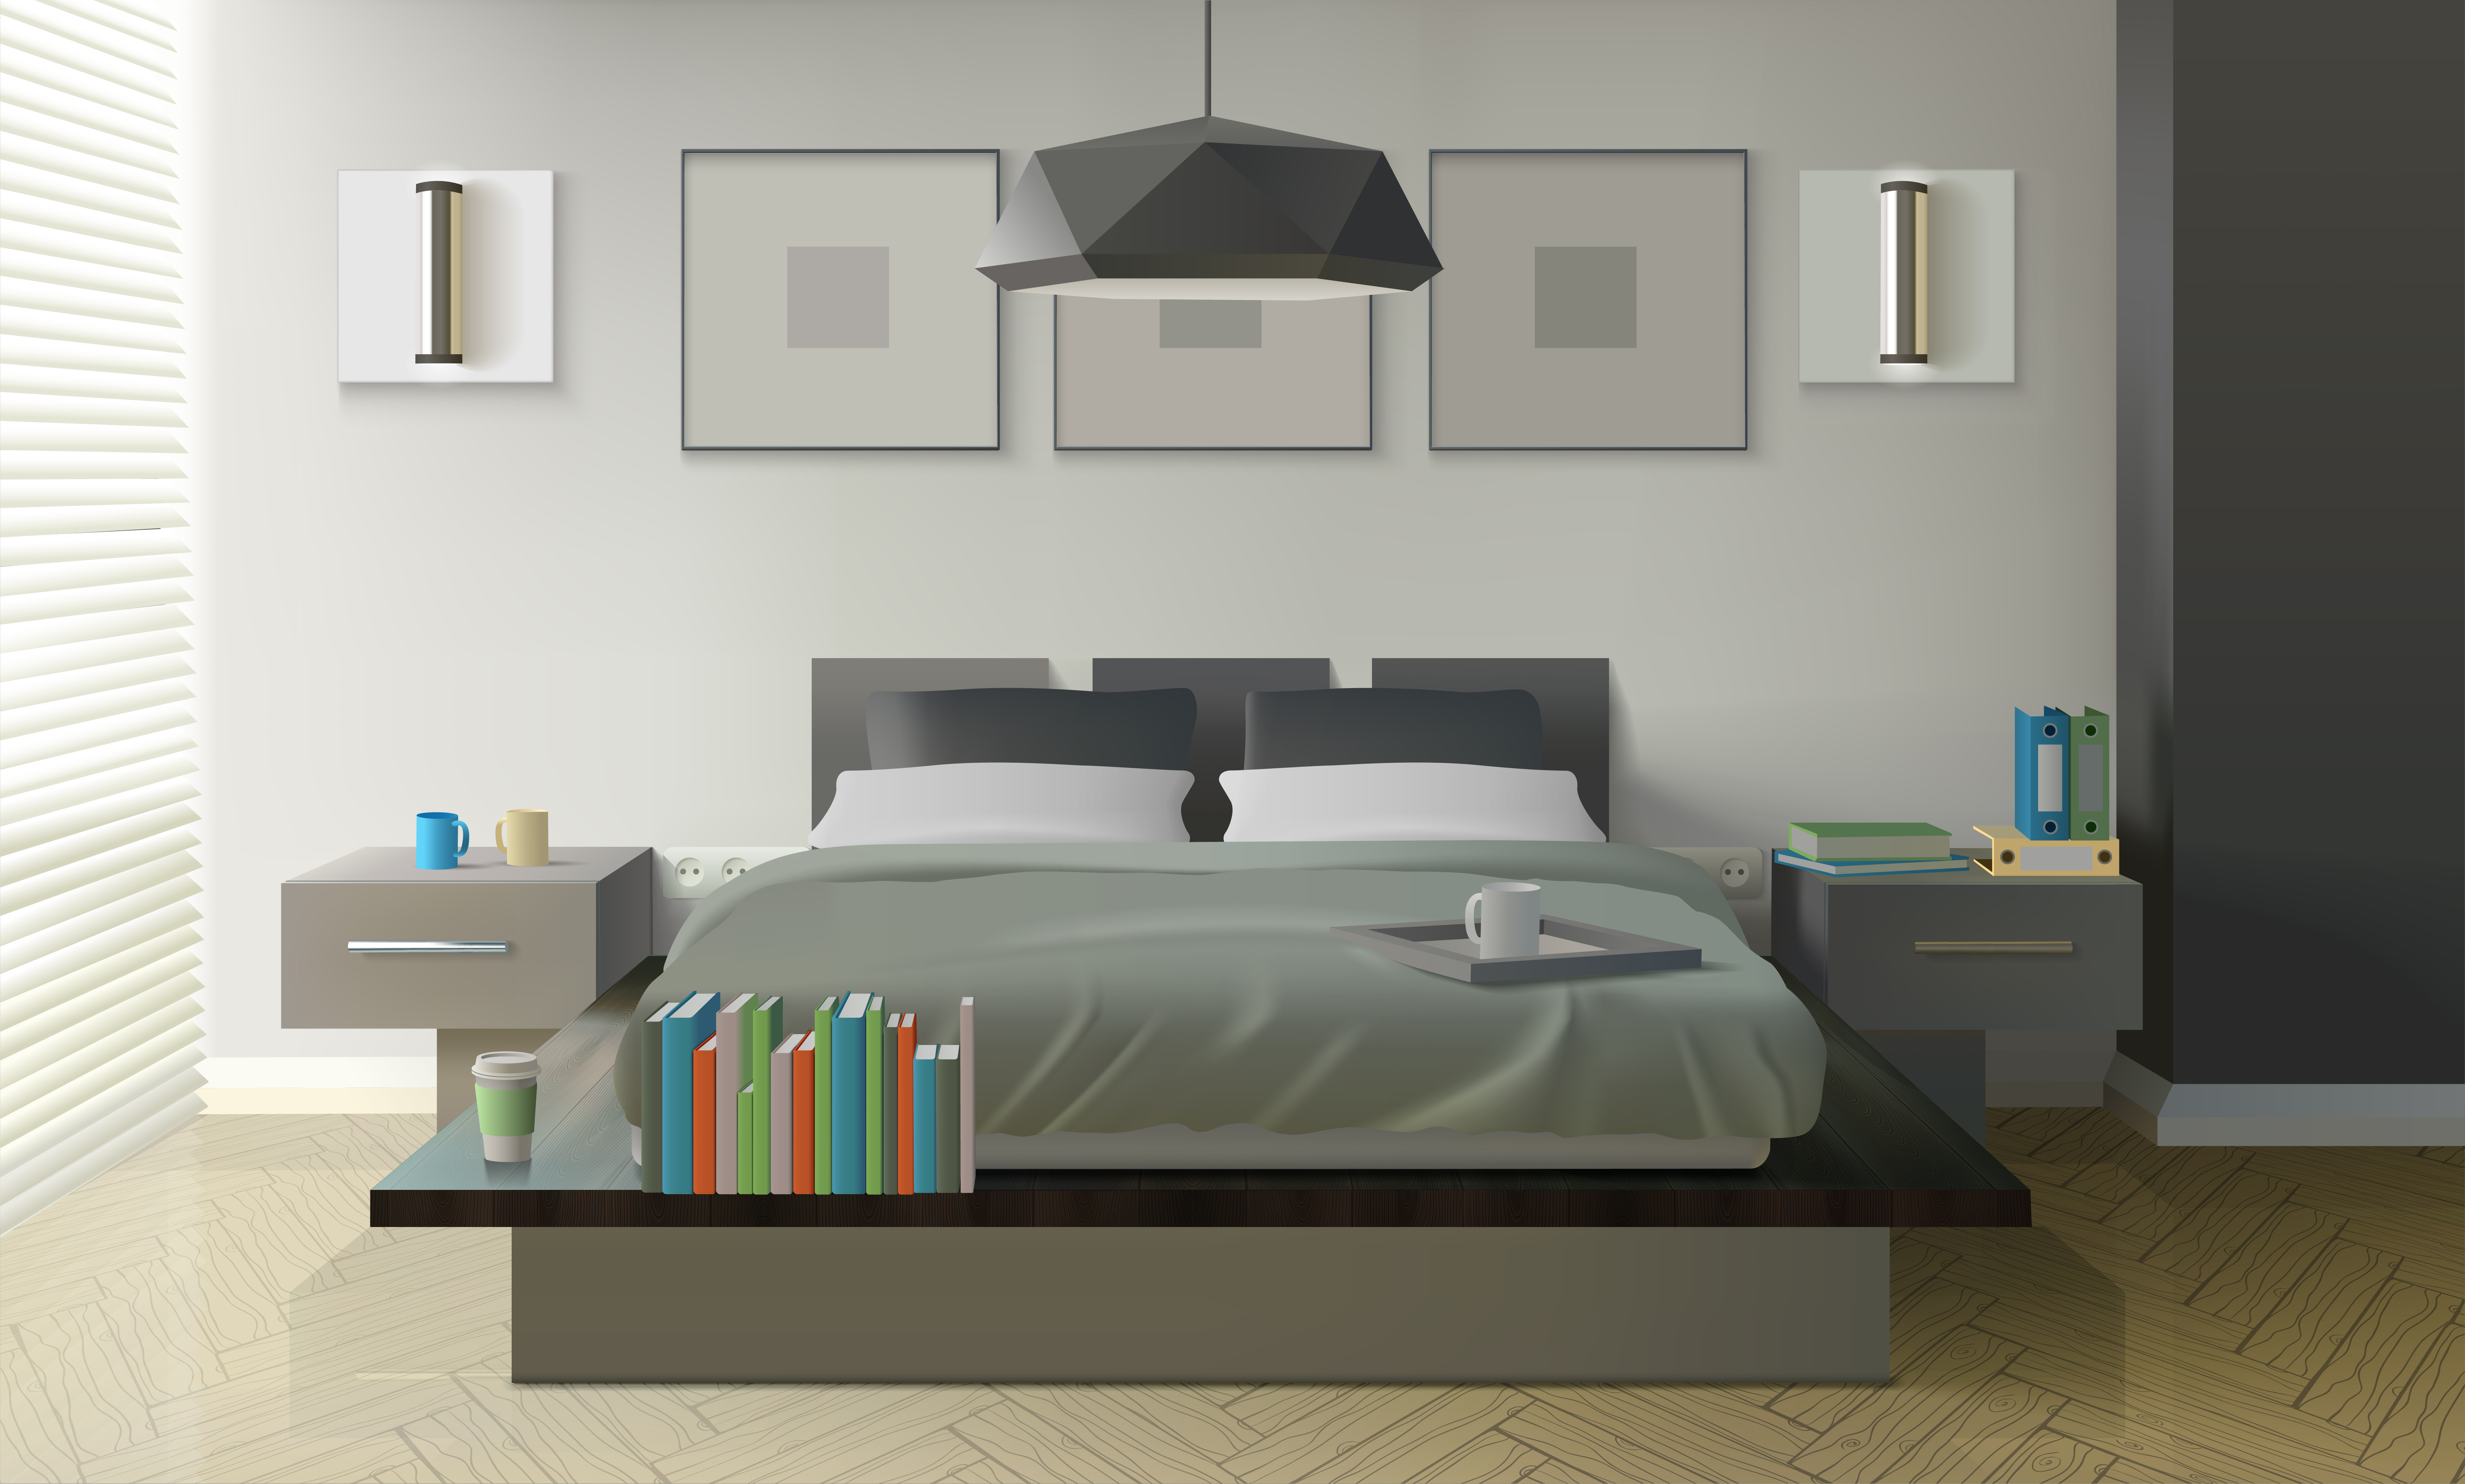 Modern Bedroom Interior Design - Download Free Vectors, Clipart